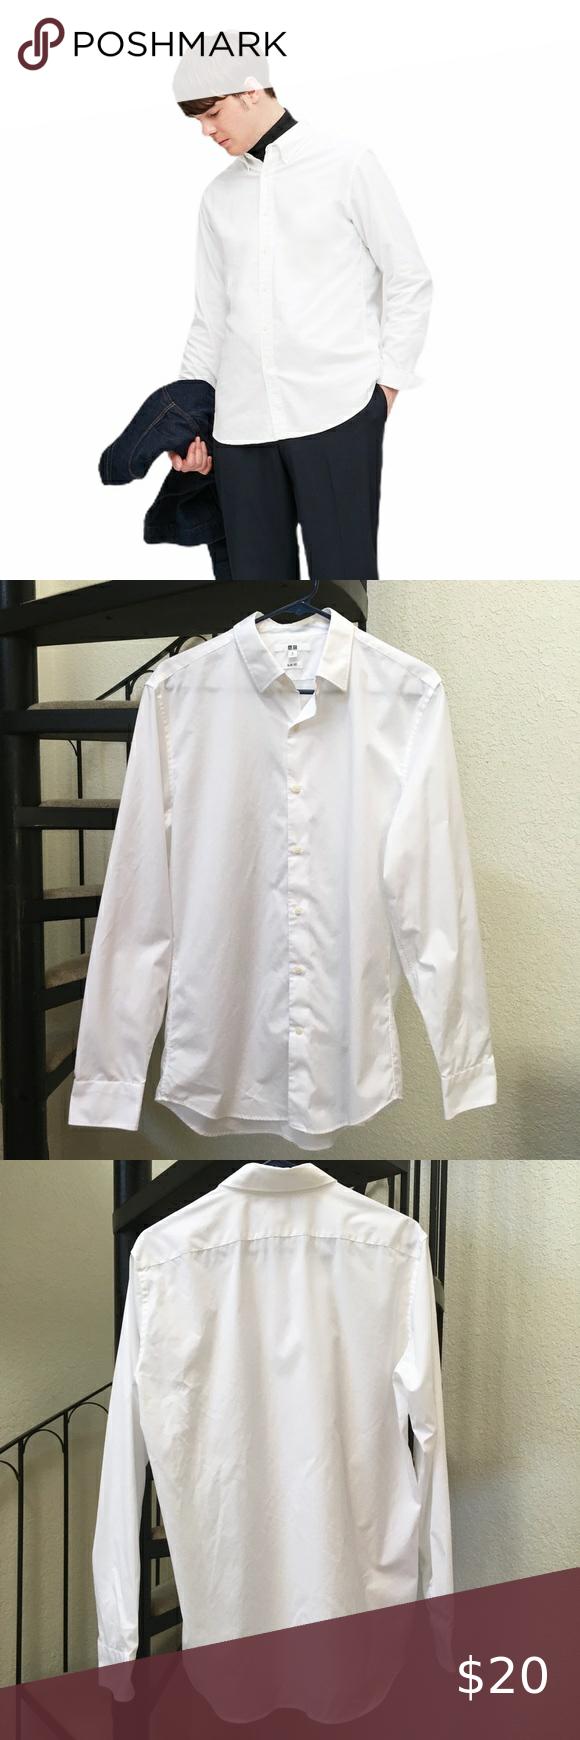 Uniqlo Slim Fit Long Sleeve Button Down Shirt M Button Up Closure Dress Shirt White Size Medium Excellent In 2020 Mens Shirt Dress Button Down Shirt Dress Shirt Colors [ 1740 x 580 Pixel ]